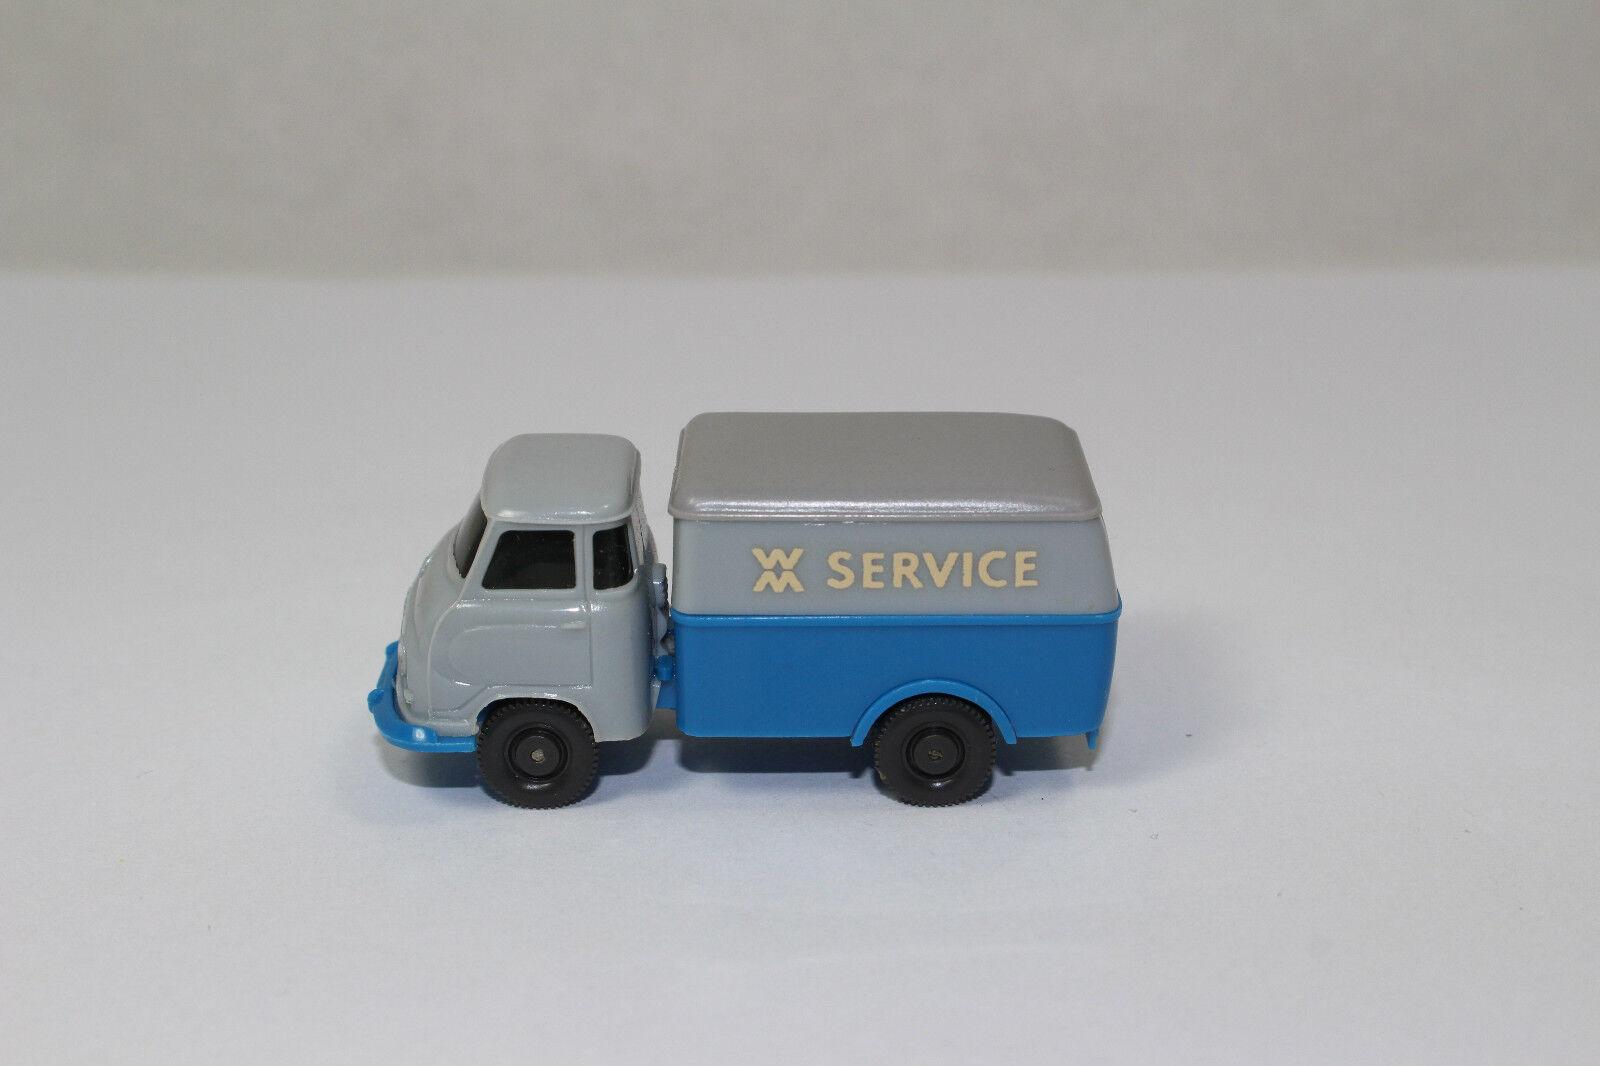 Sw2346, Wiking Hanomag Coursier Camionnette Service 1 87 HO 344 1 A